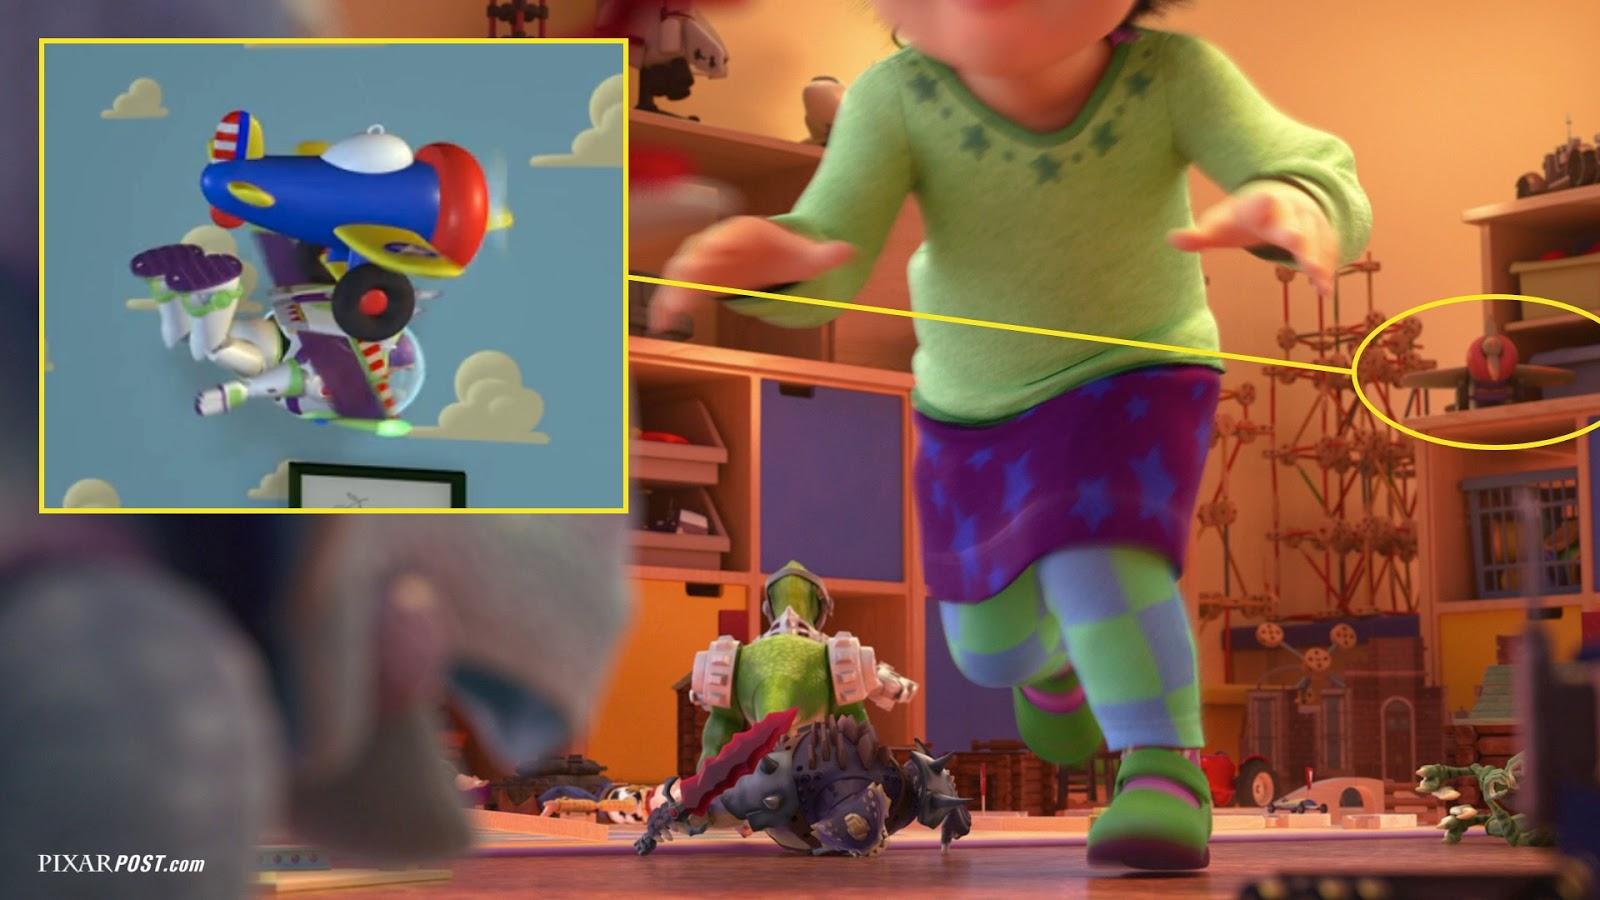 Pixar Cars Bedroom Wallpaper In Depth Look At The Easter Eggs Hidden In Toy Story That